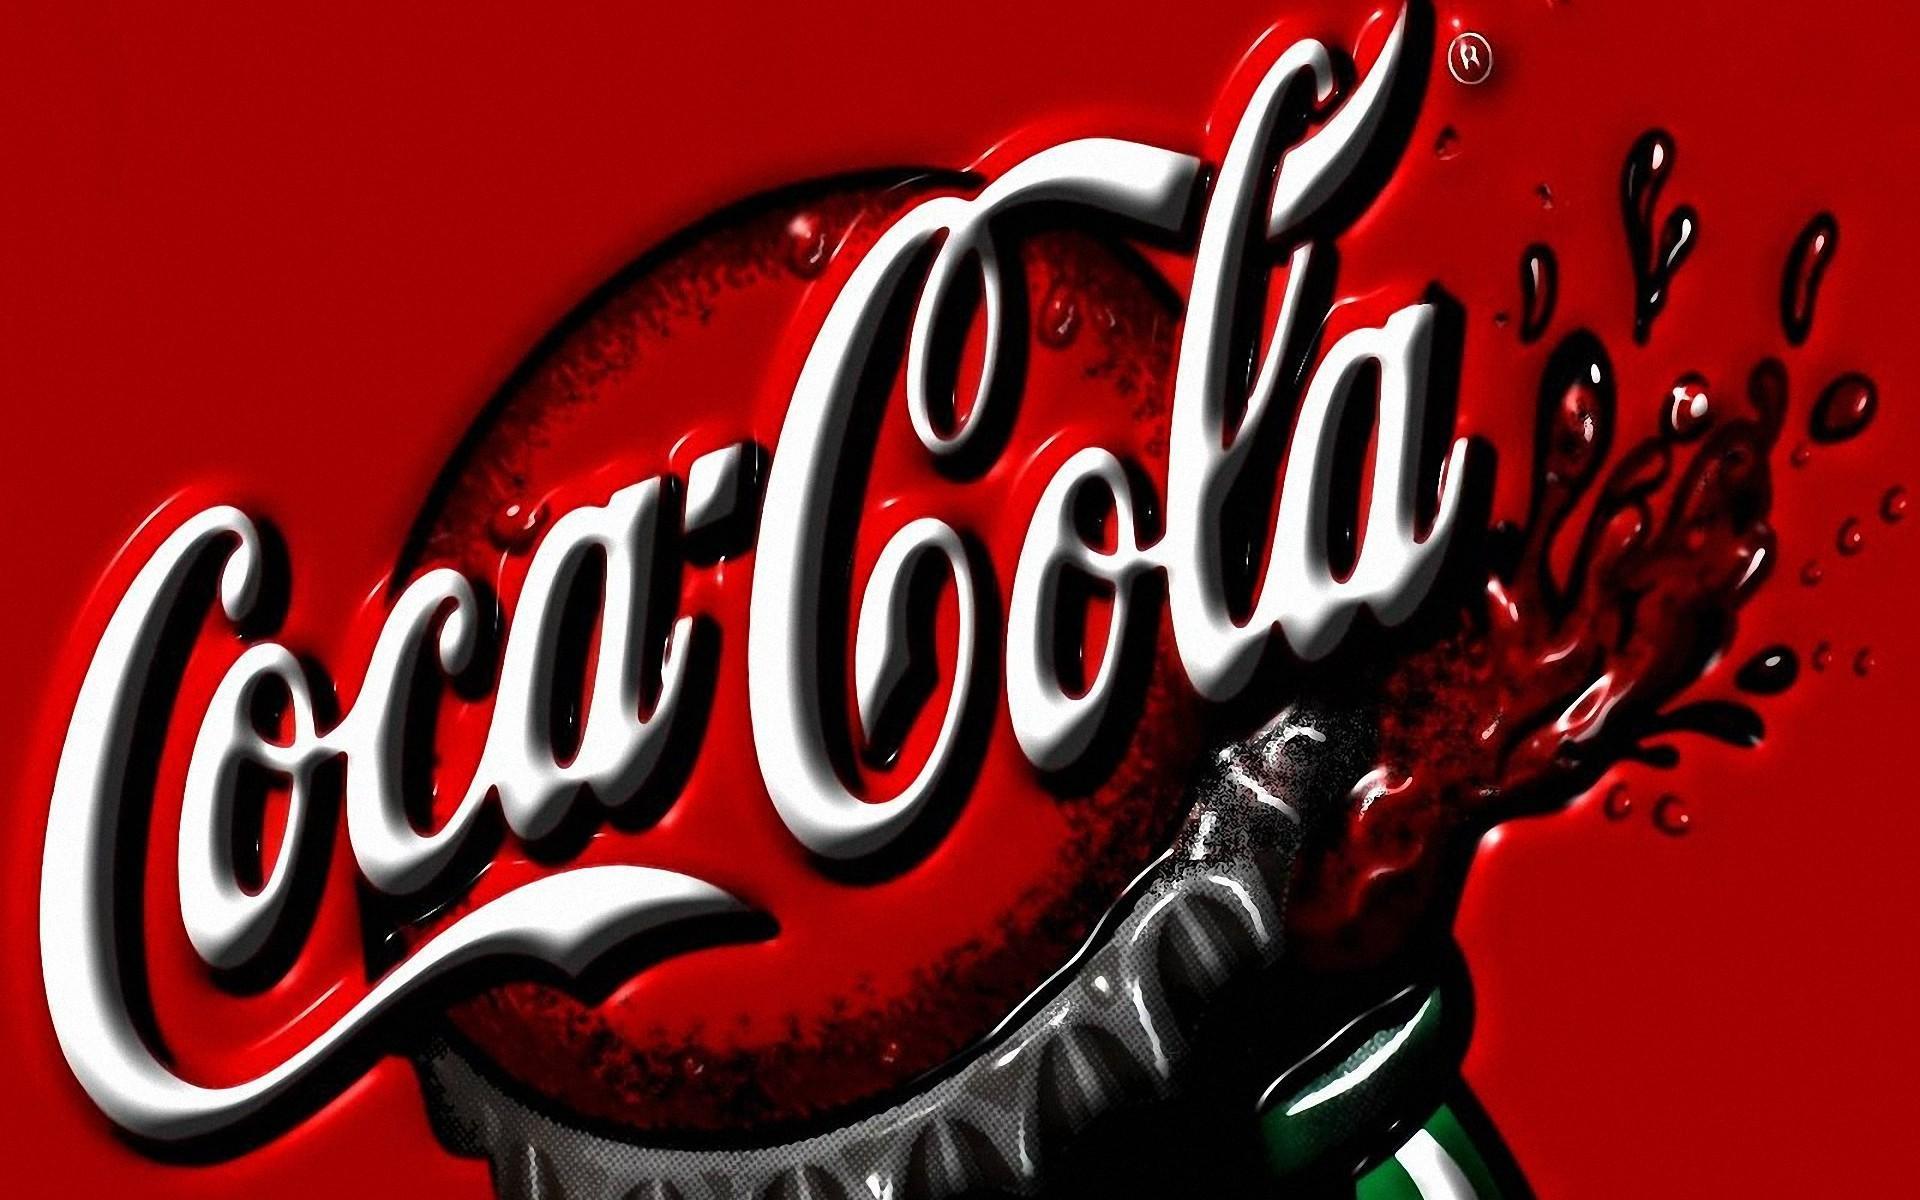 Coca Cola Wallpapers Widescreen 3 Jpg 1920x1200